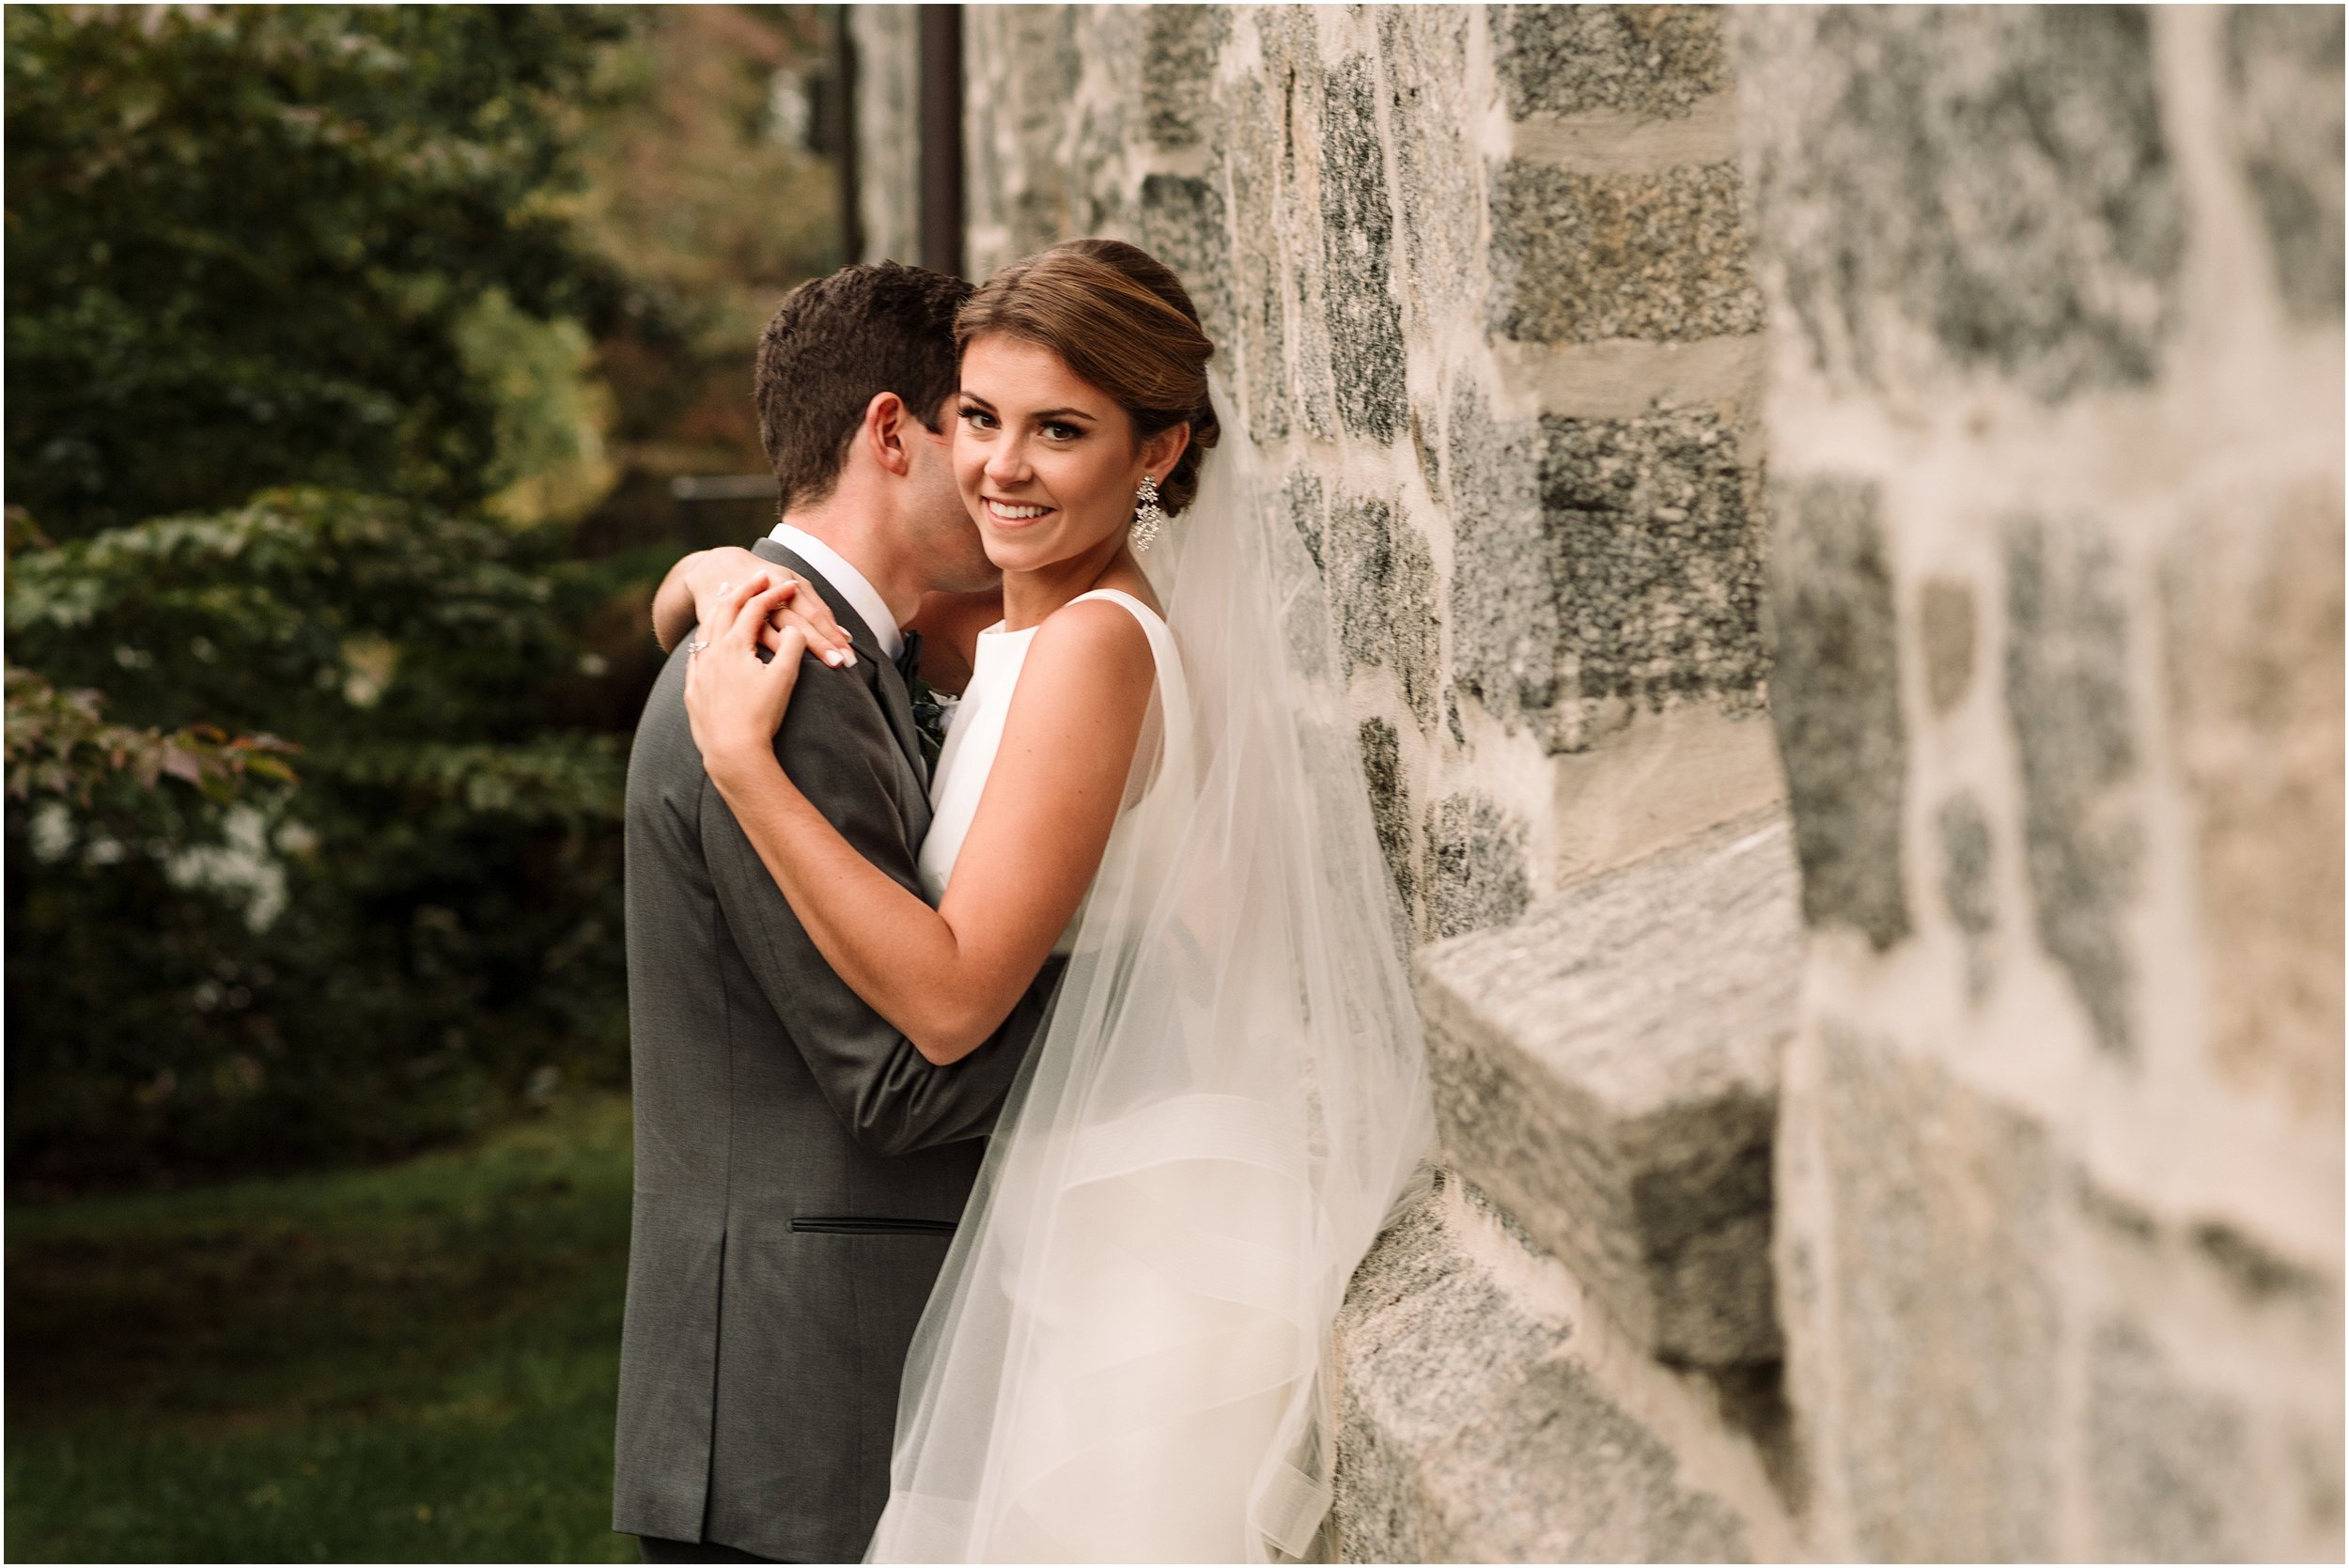 hannah leigh photography ellicott city church wedding baltimore md_2146.jpg